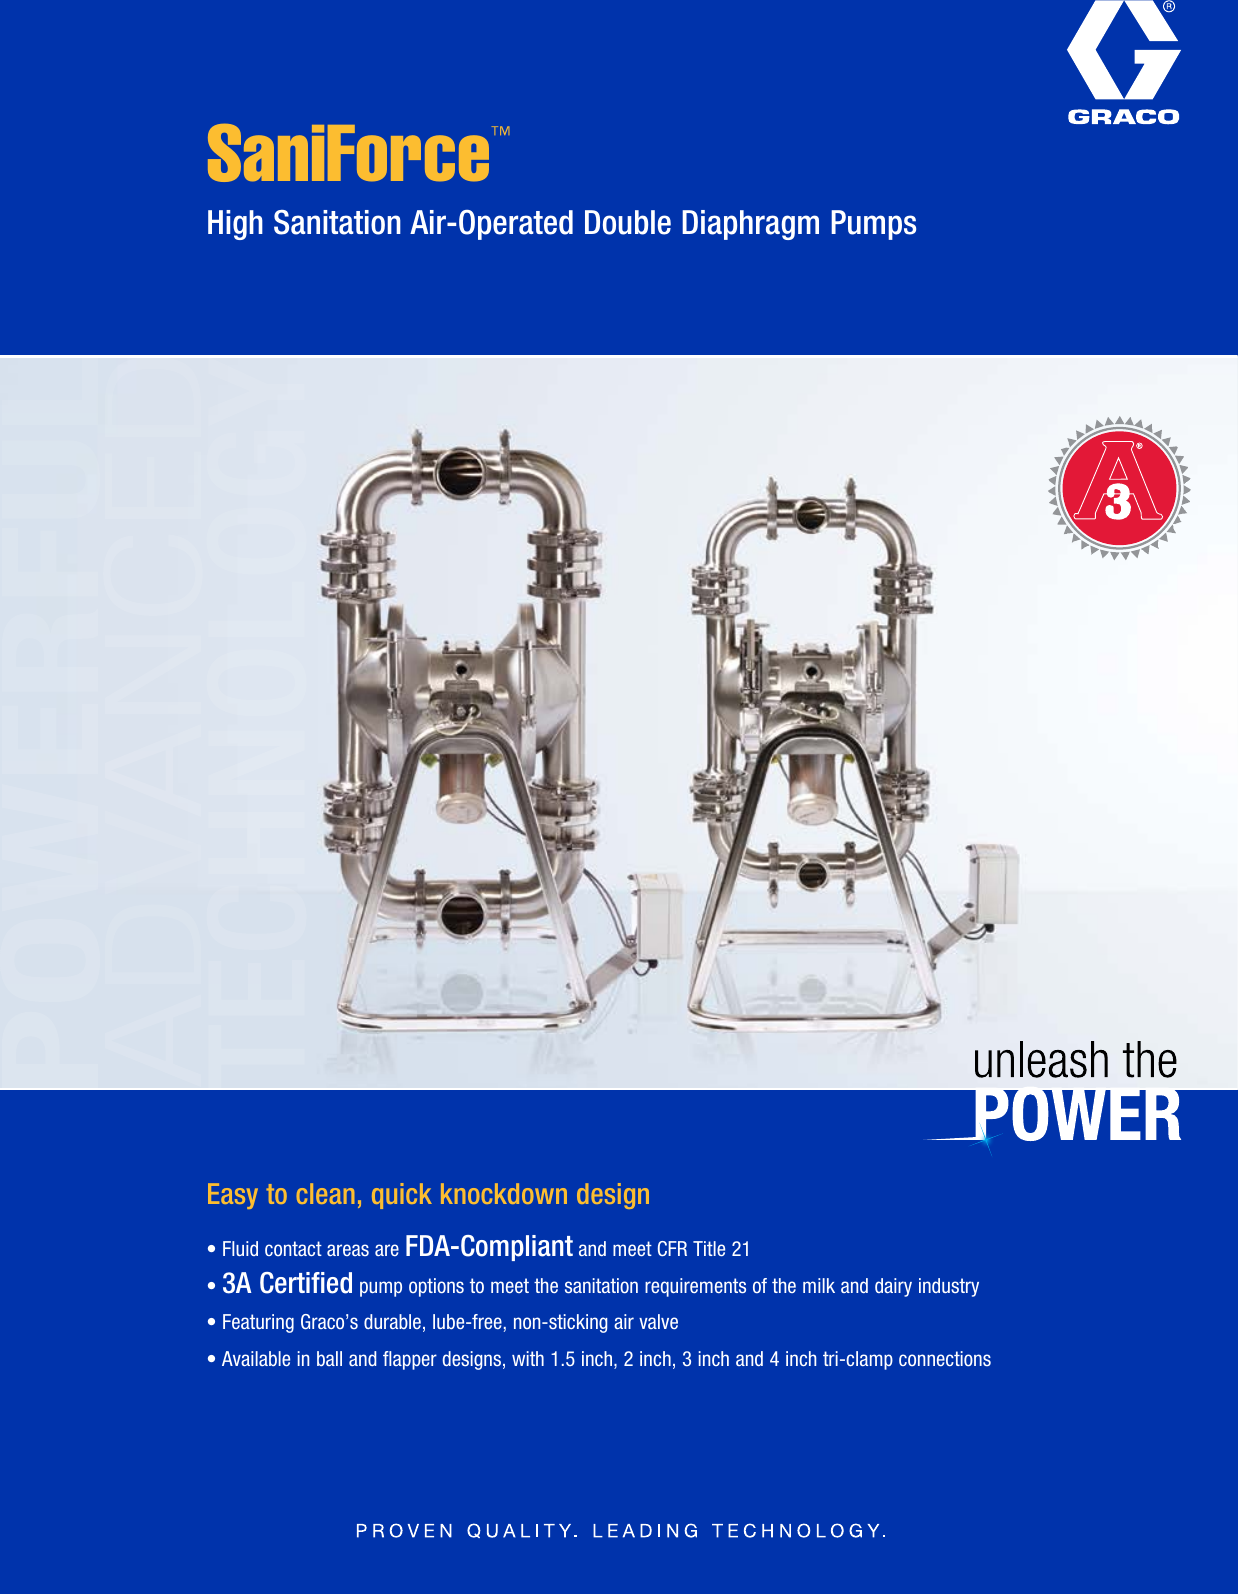 Graco 338499En F 1590 And 3150 Hs Pumps Users Manual